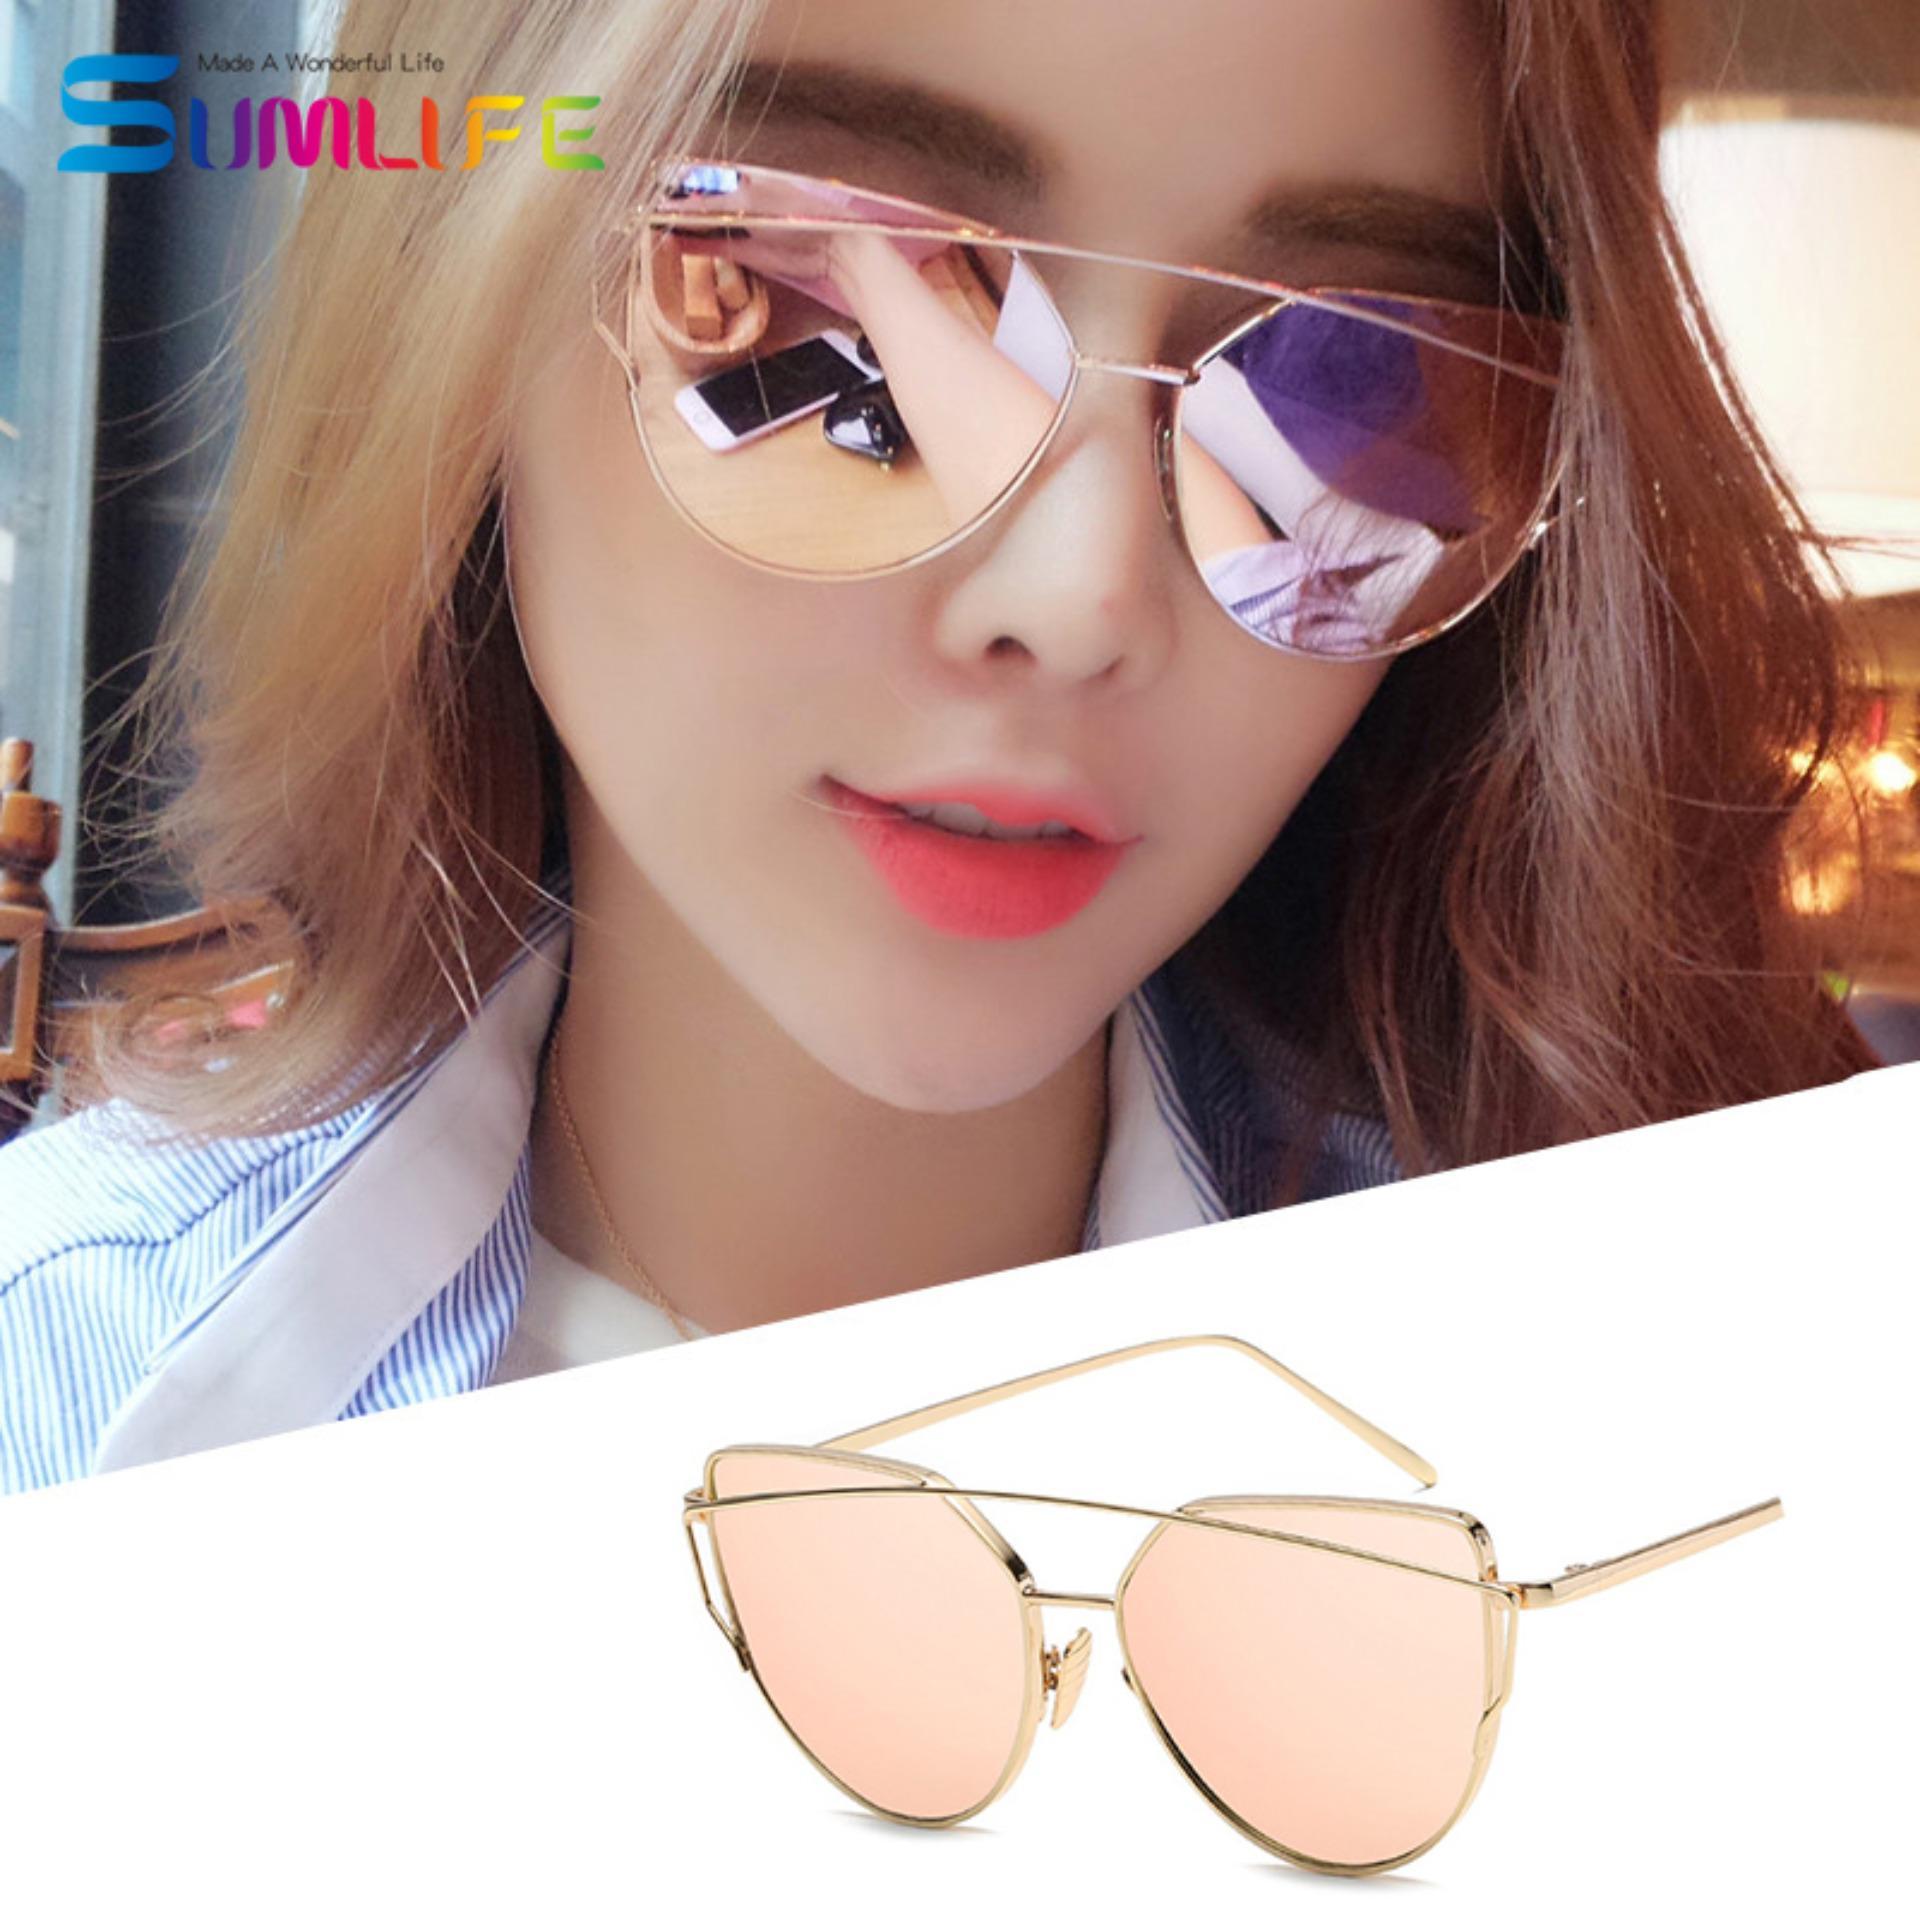 Fashion Baru Logam Warna Film Kacamata Pria dan Women Retro Style Sunglasses-Emas Bingkai Rose Bubuk Emas-Intl